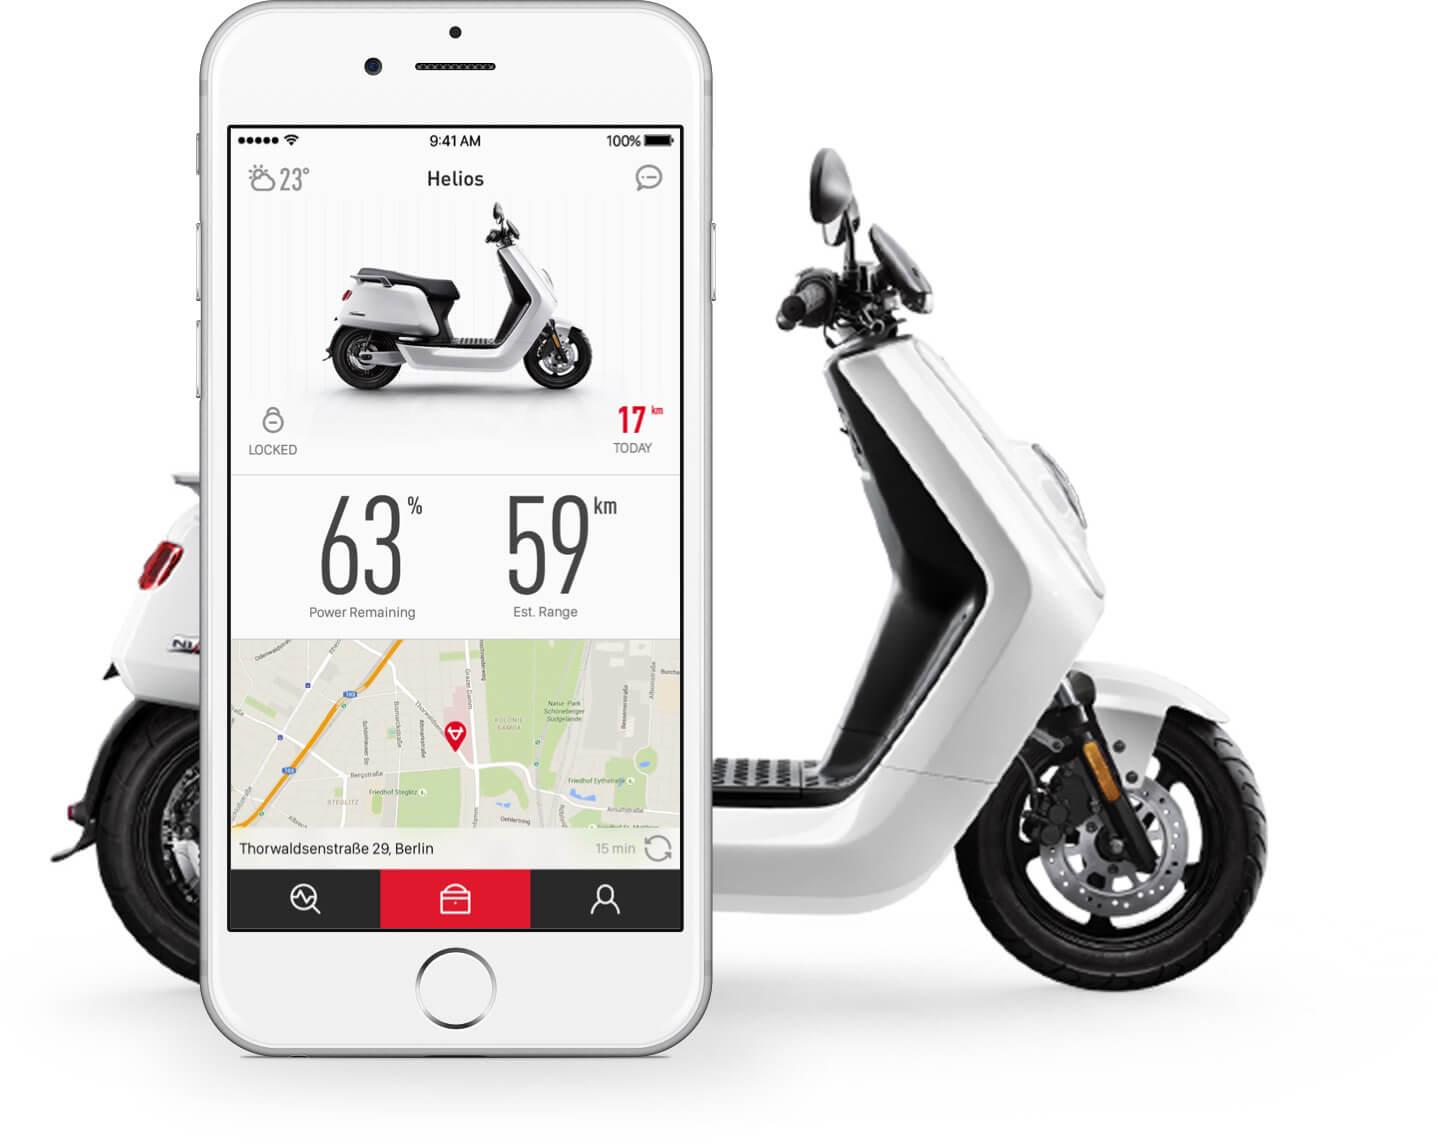 achat e-scooter paris-niu-paris